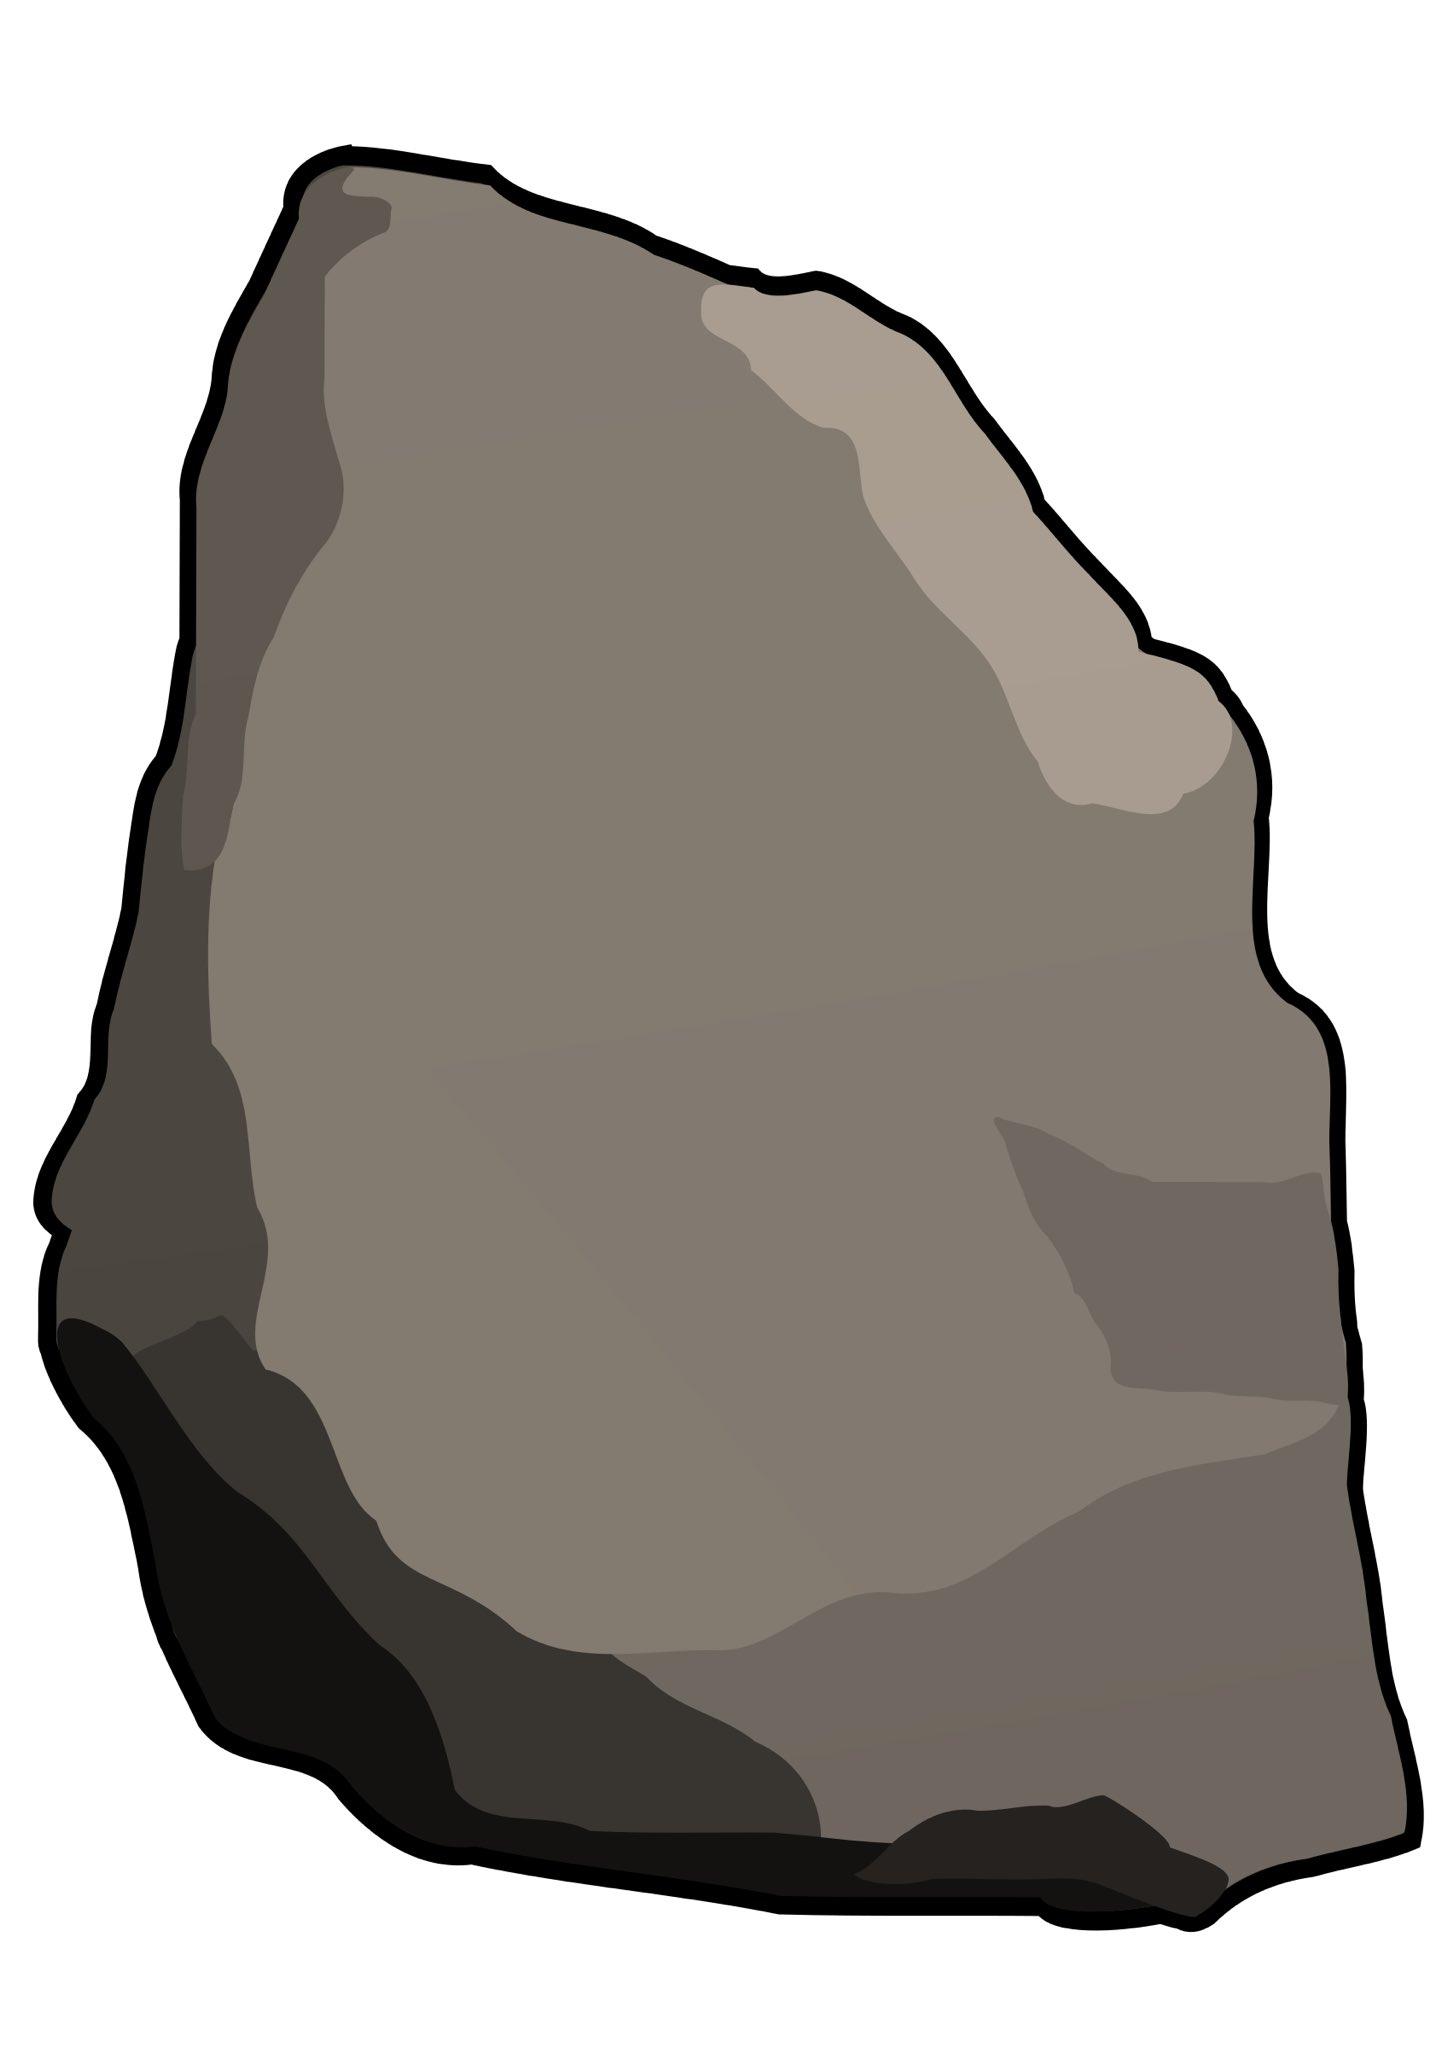 The Rock NFT